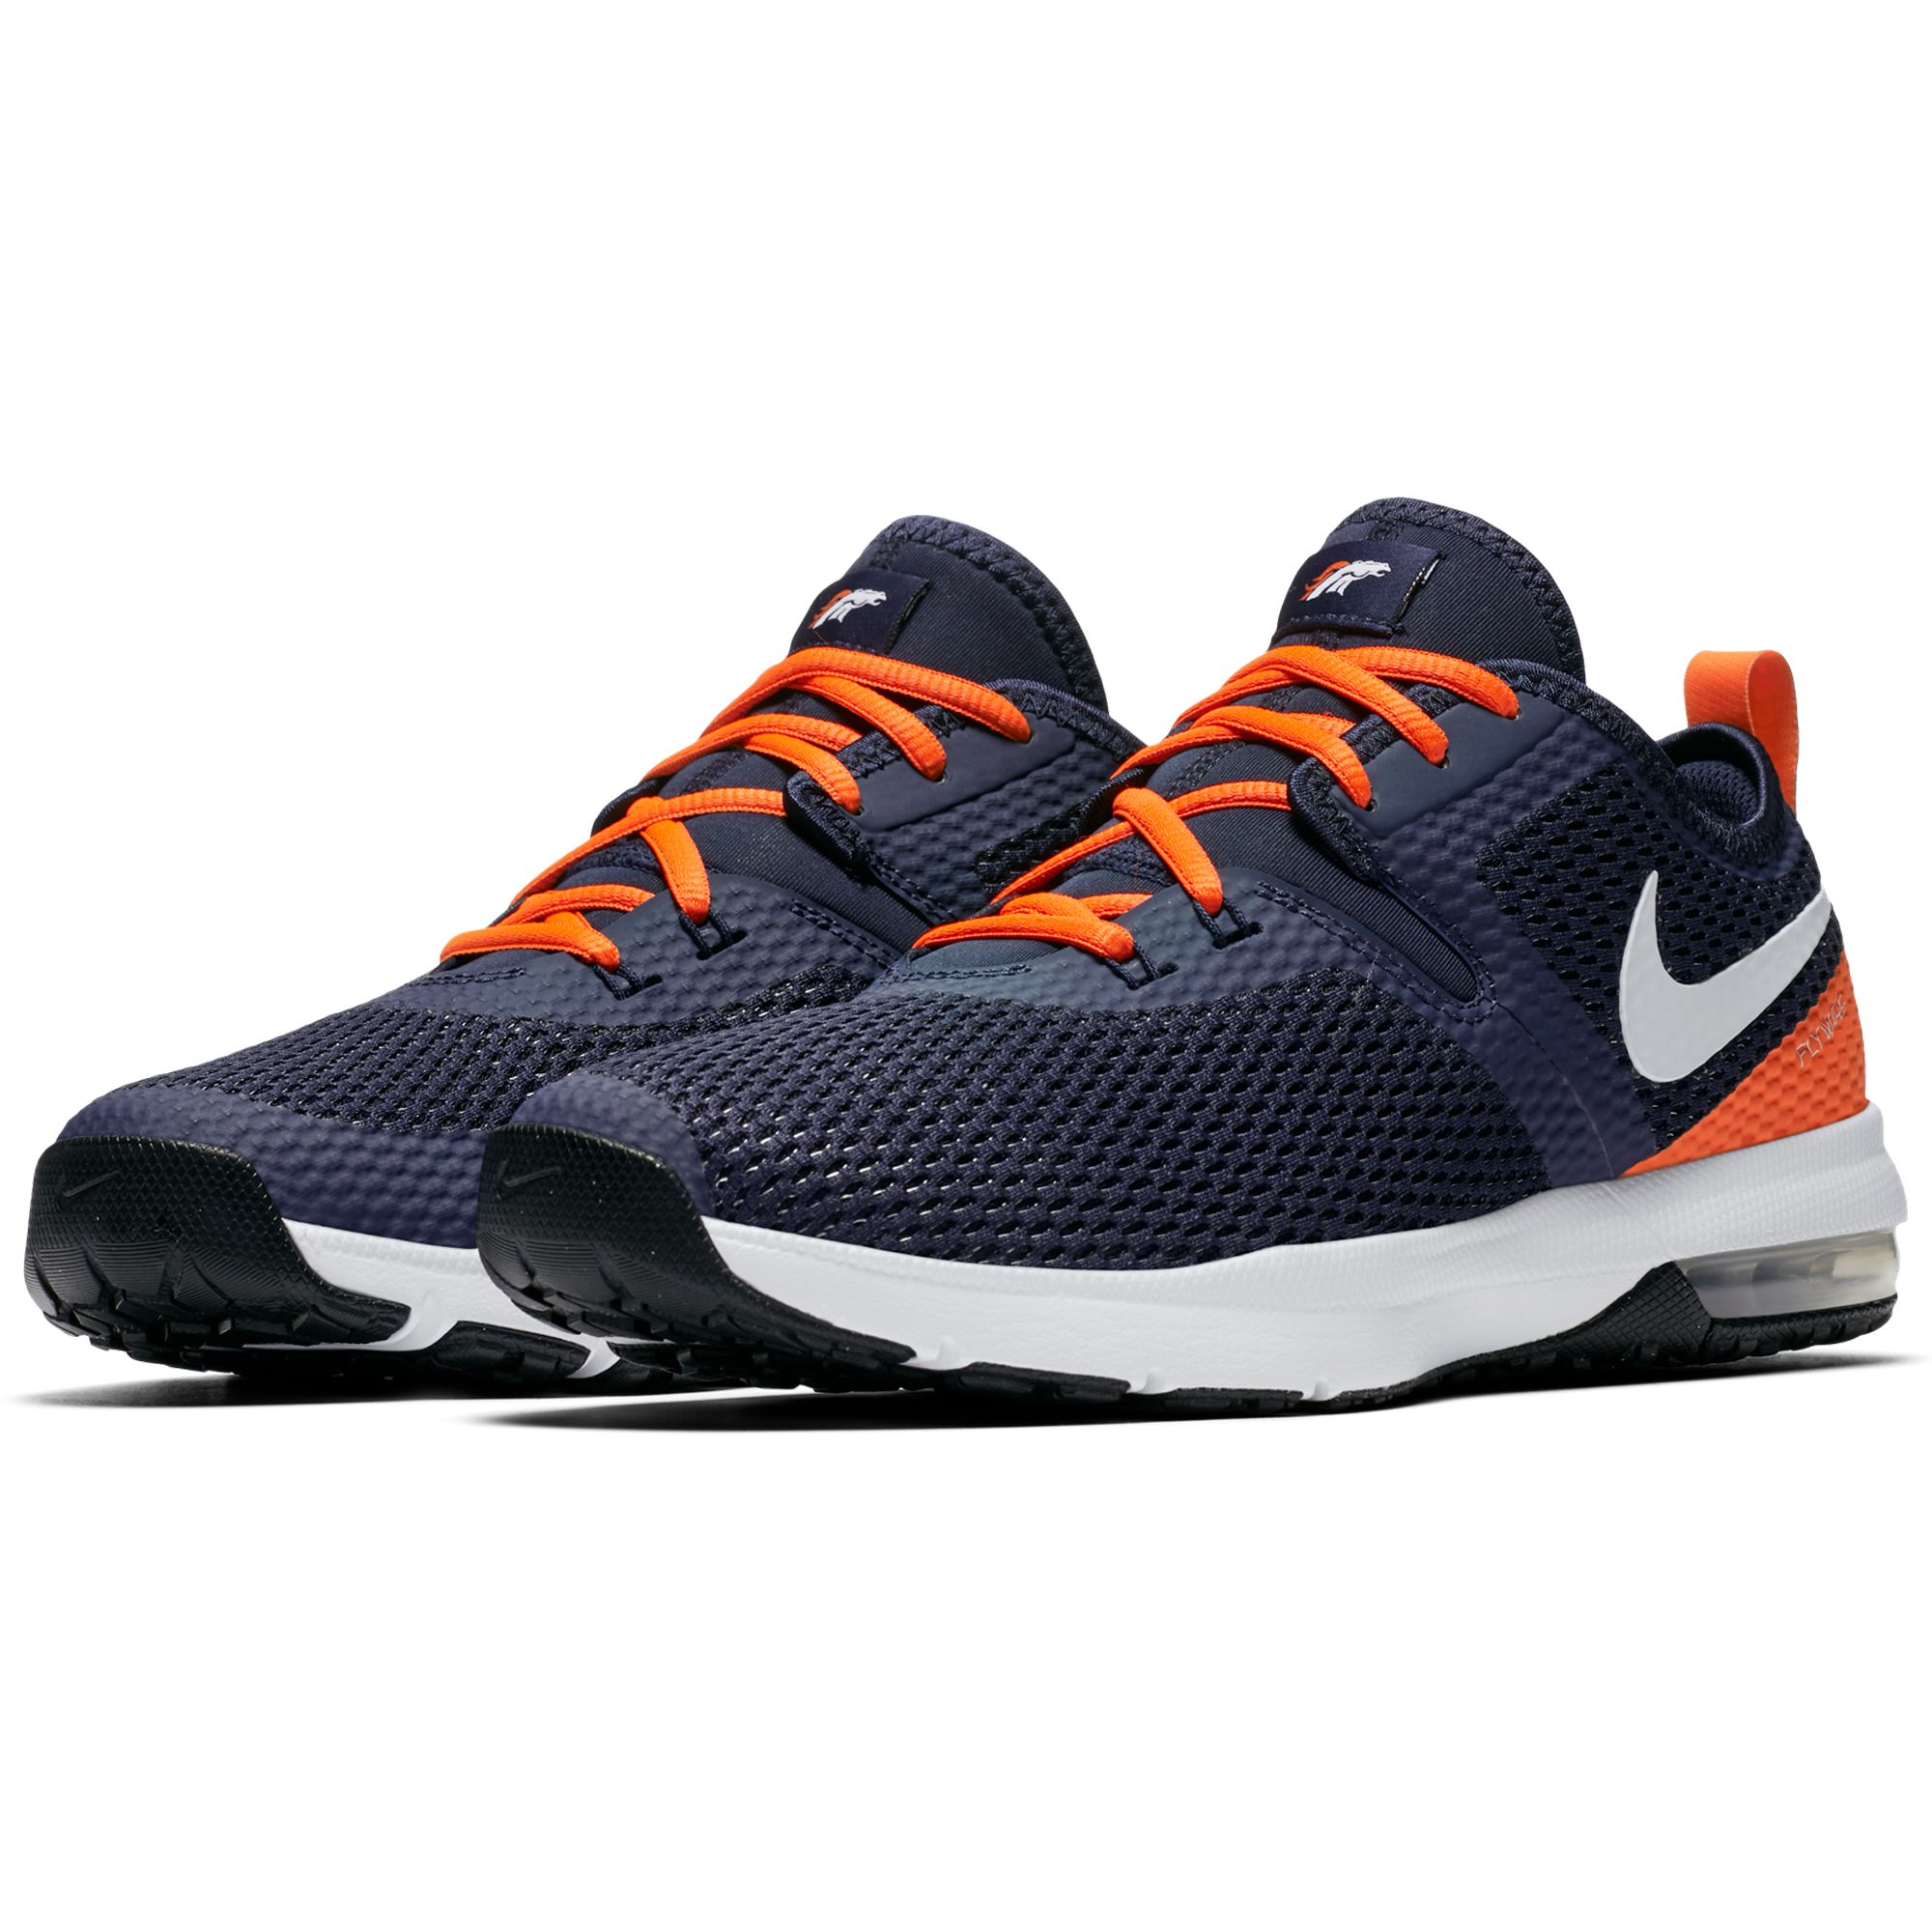 1d3309676eba25 NFL Denver Broncos Nike Air Max Typha 2 Shoes     Navy Orange ...